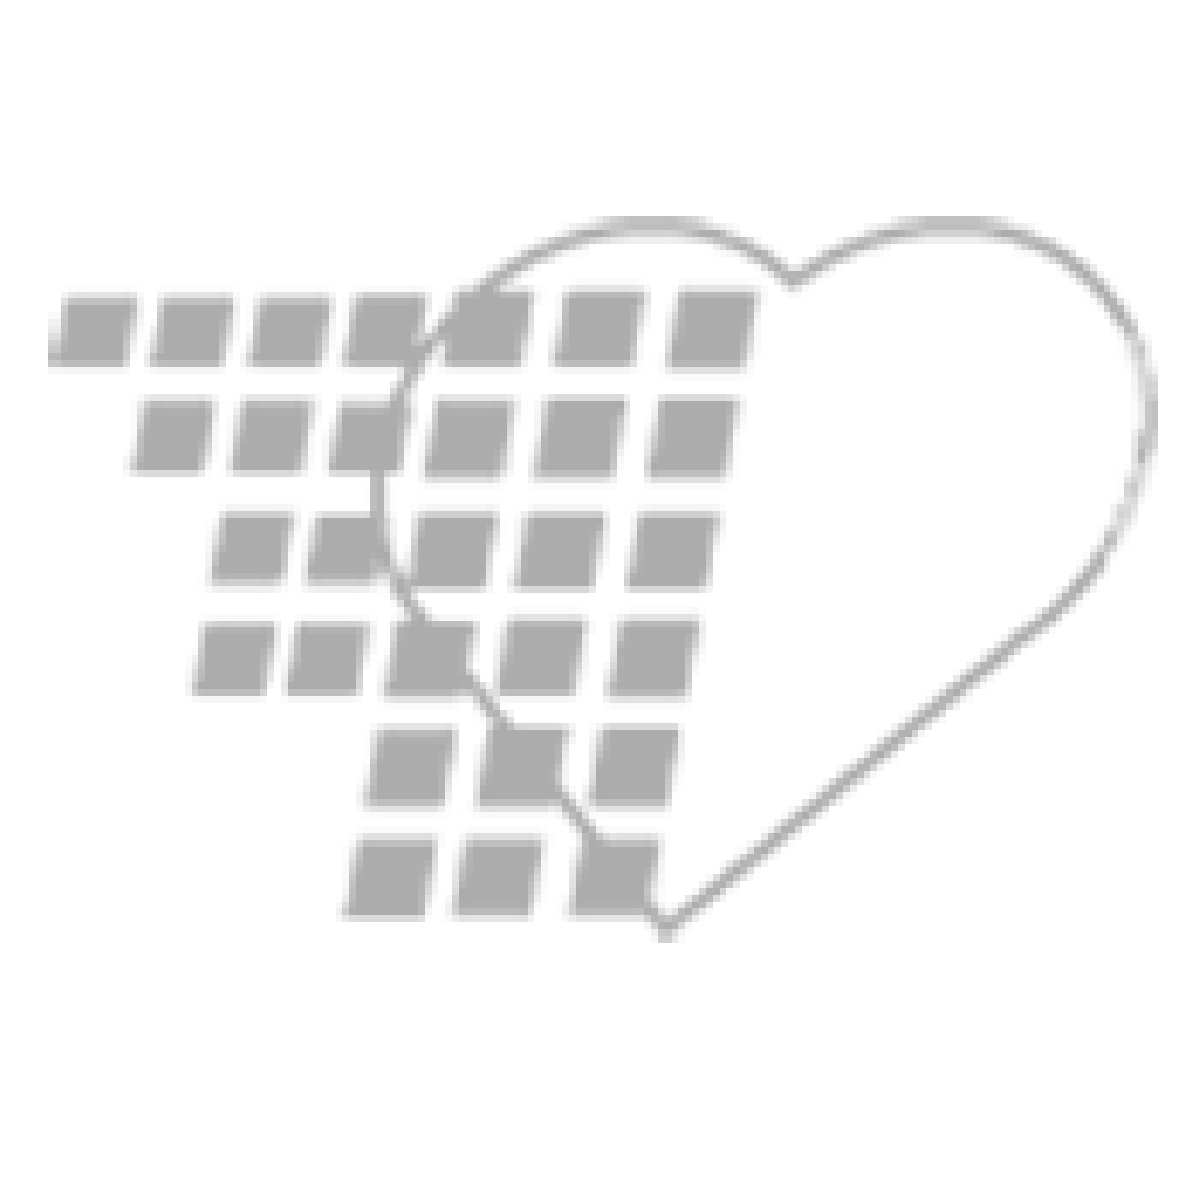 06-93-7581 Demo Dose® MMR Vaccine Syringes Repackaging Kit